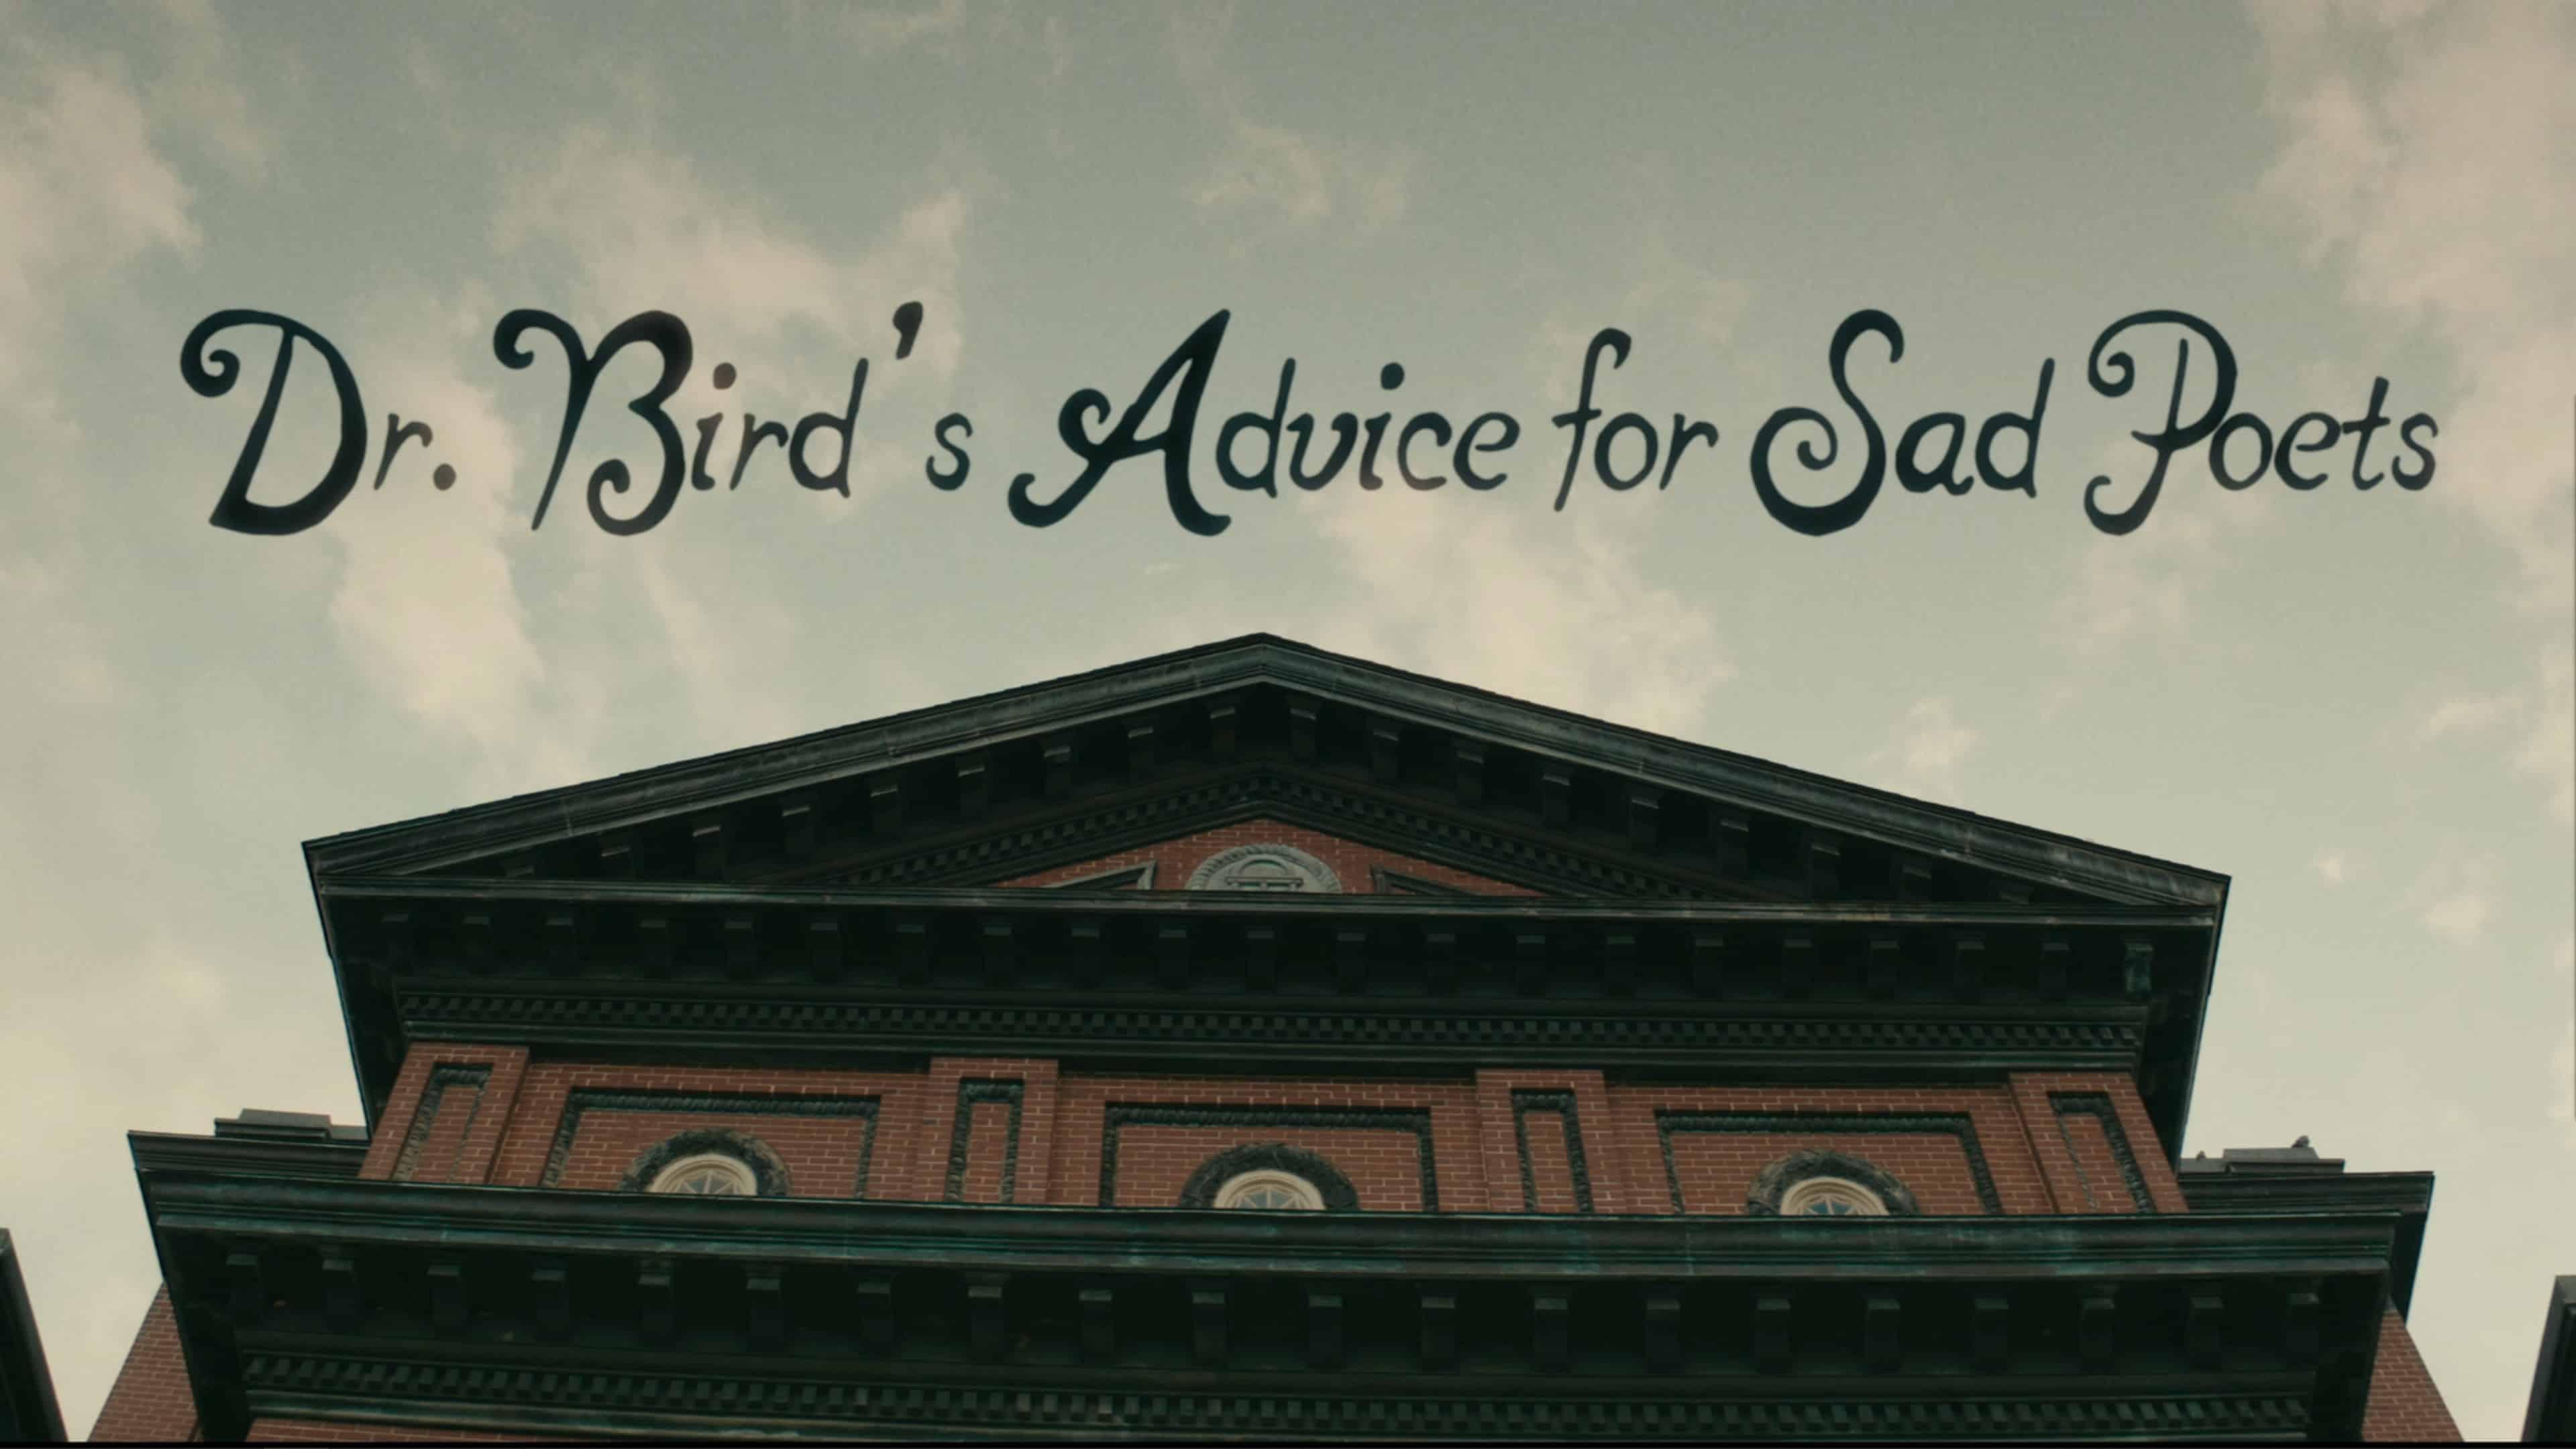 Title Card - Dr. Bird's Advice for Sad Poets